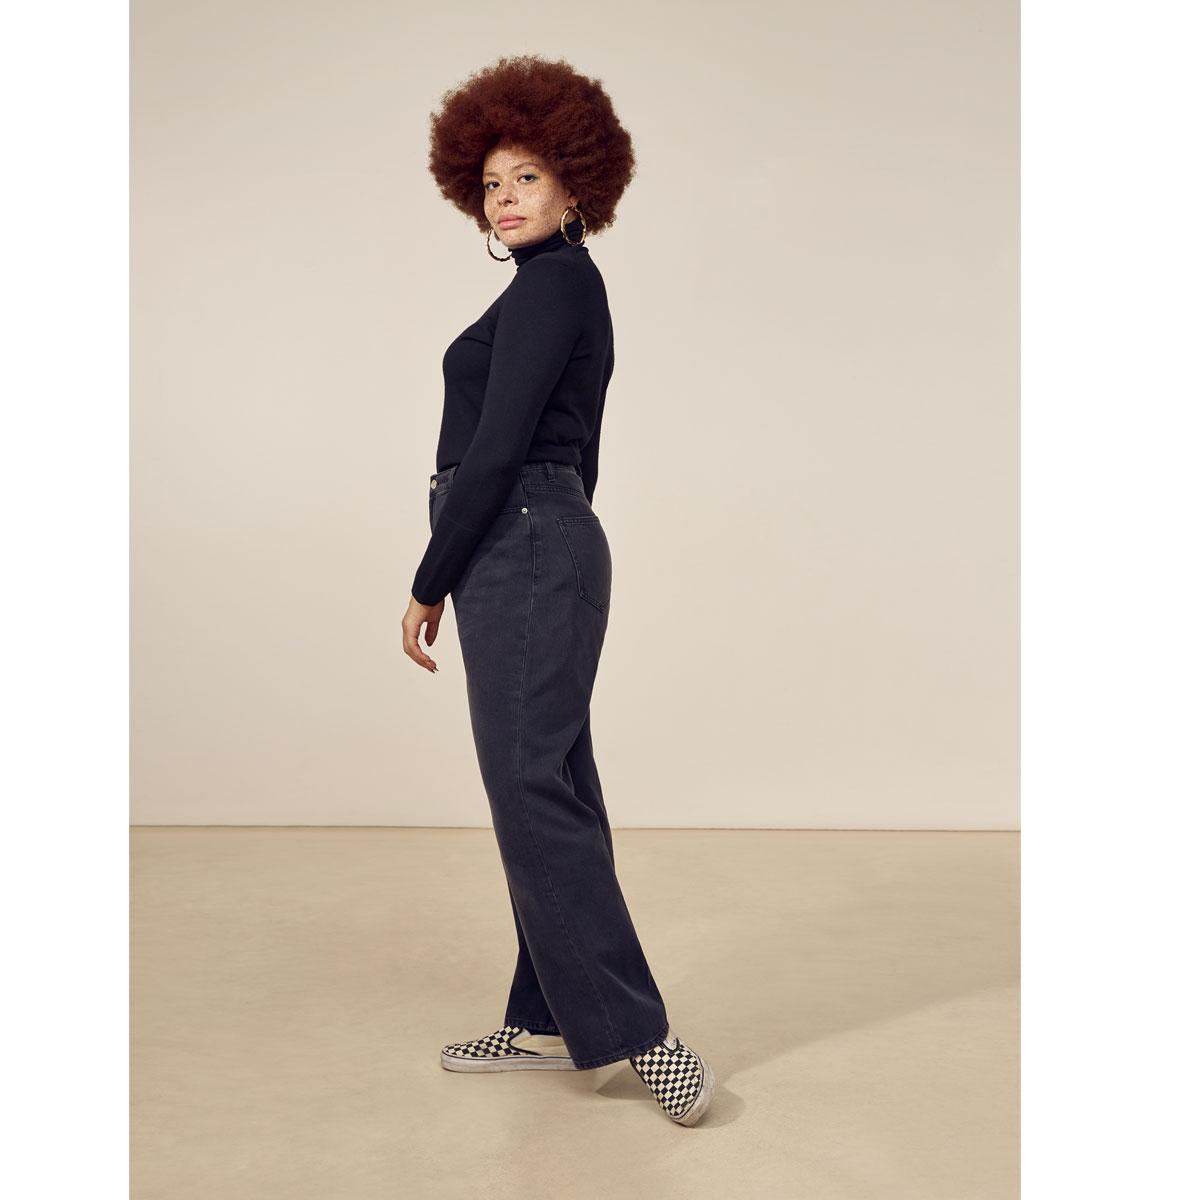 LAB DIP Pantalon SULLY Black Washed